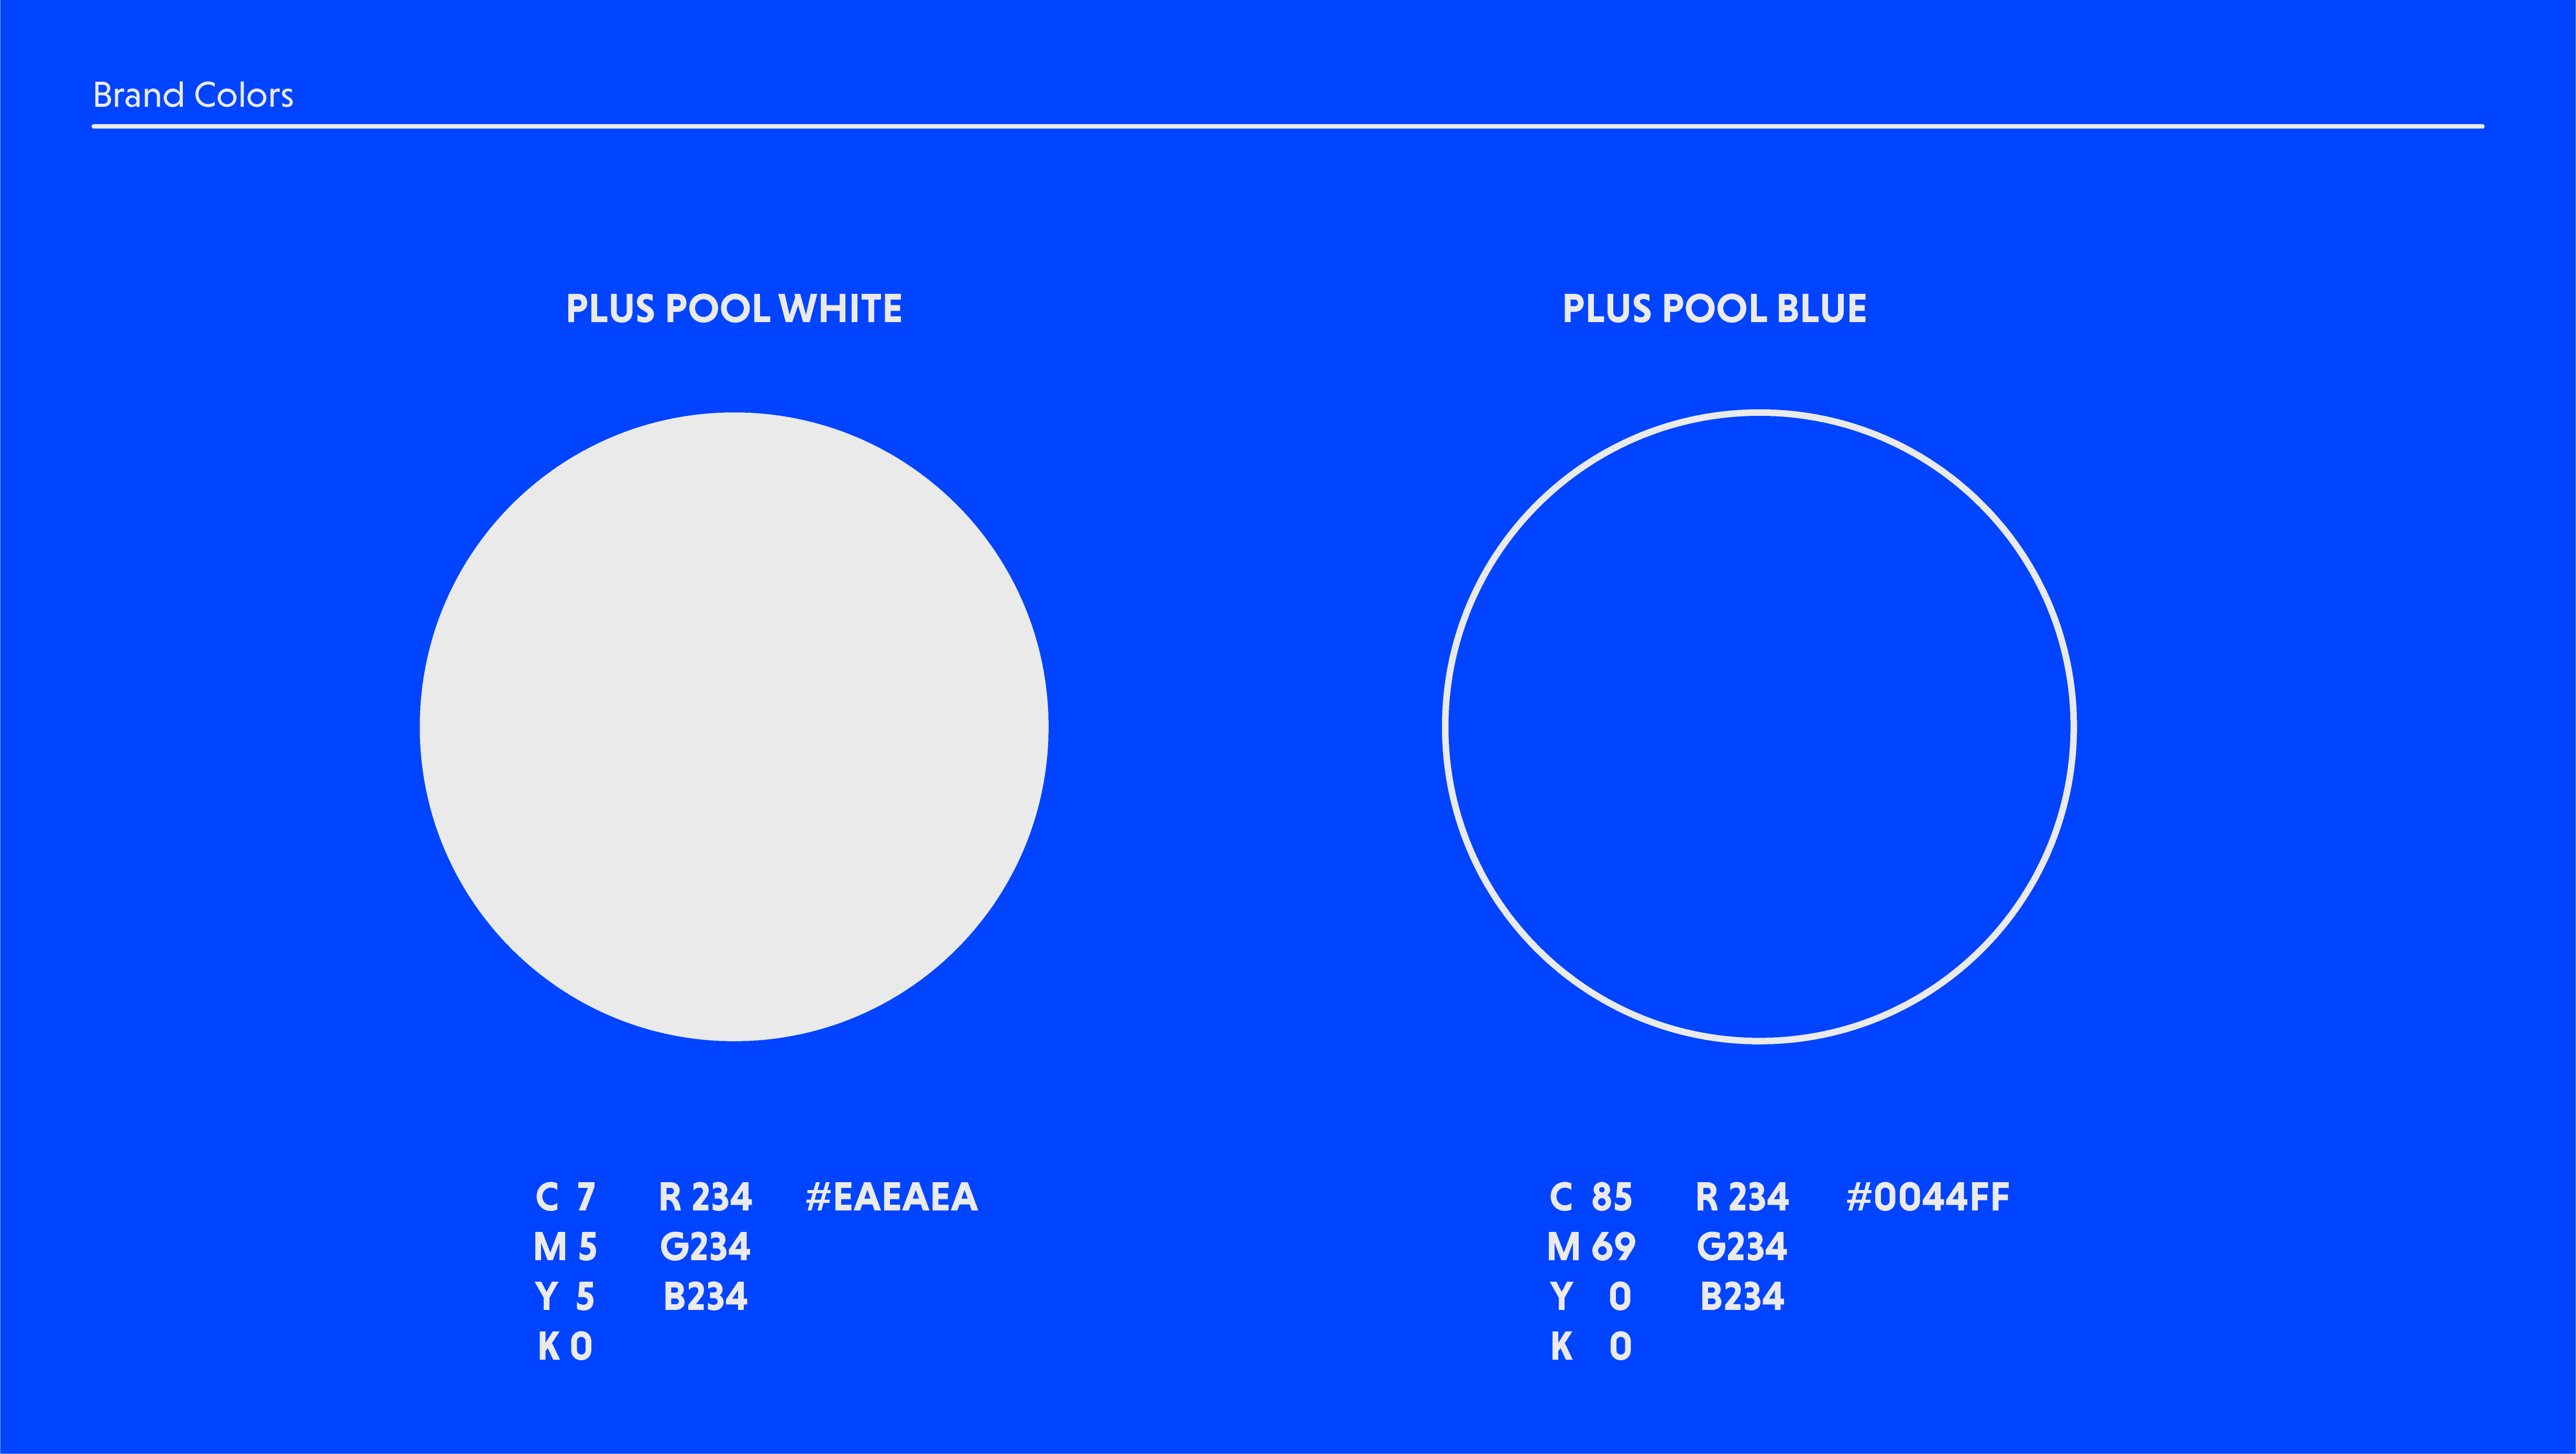 pluspool_plus_pool_blue copy